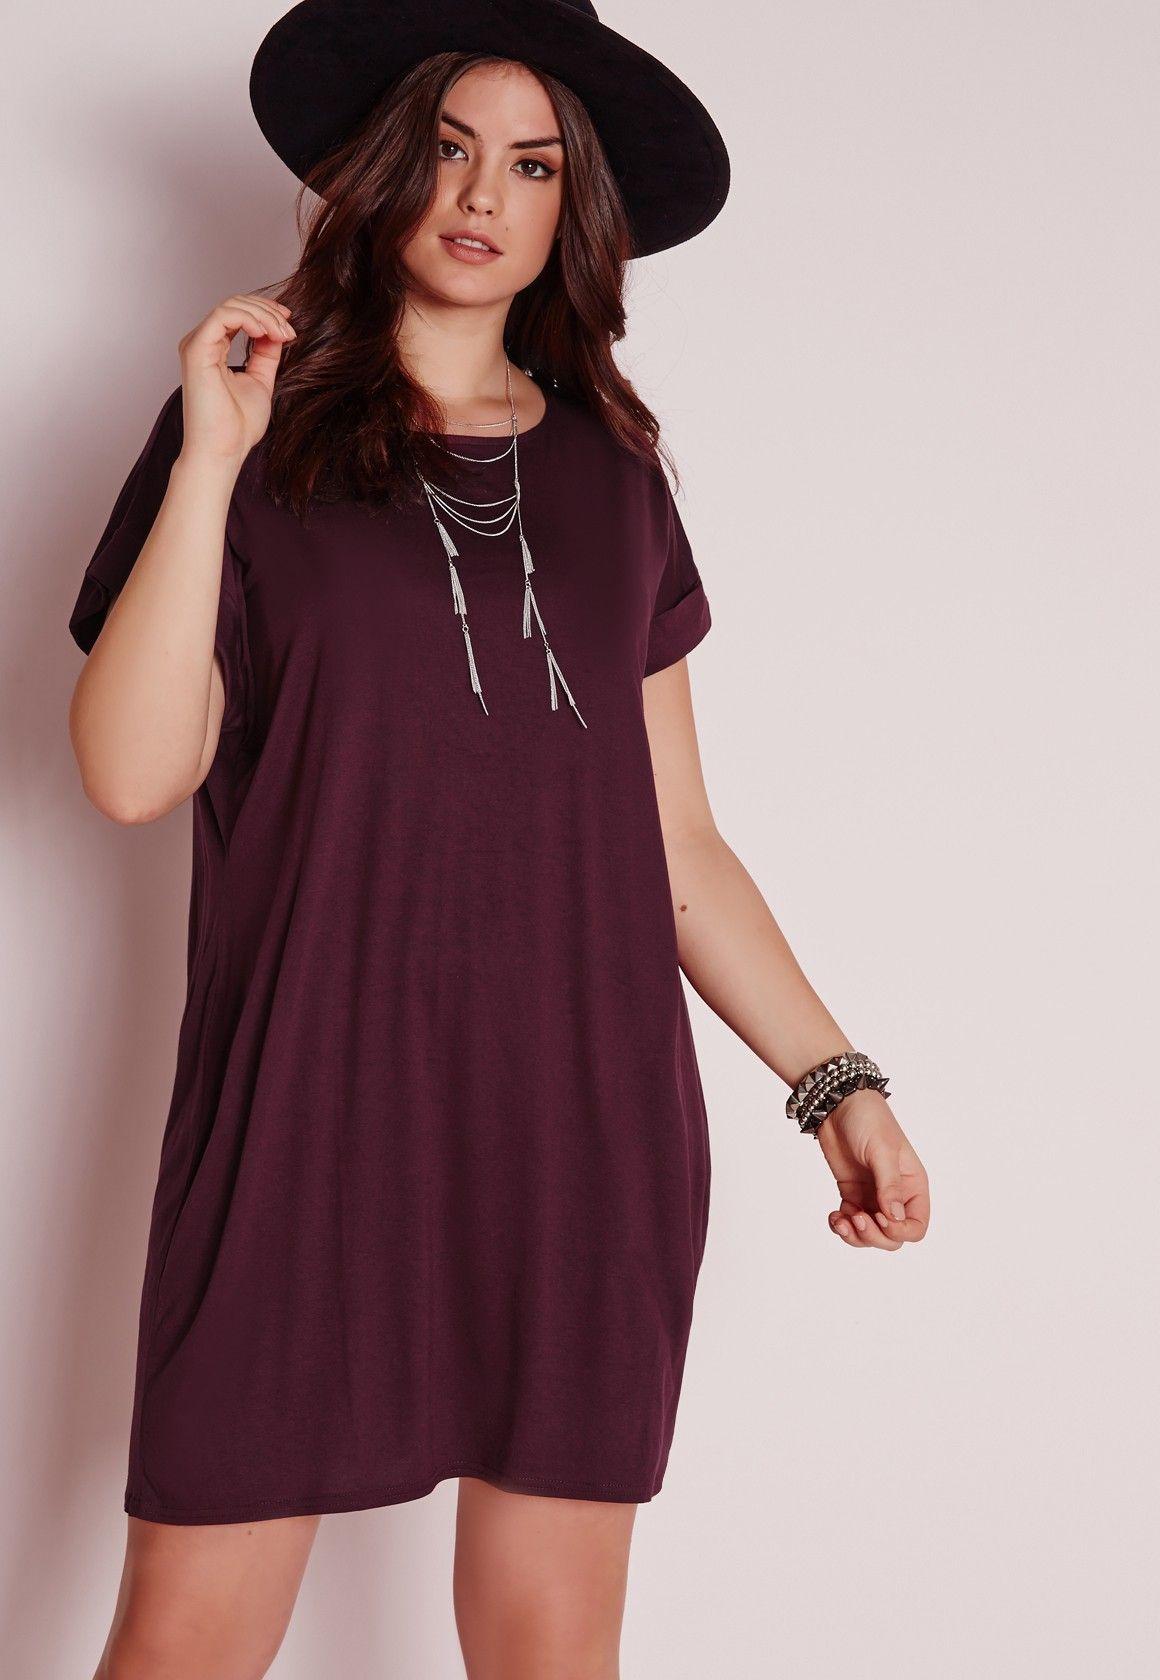 Missguided - Plus Size T-Shirt Dress Purple | Style | Pinterest ...